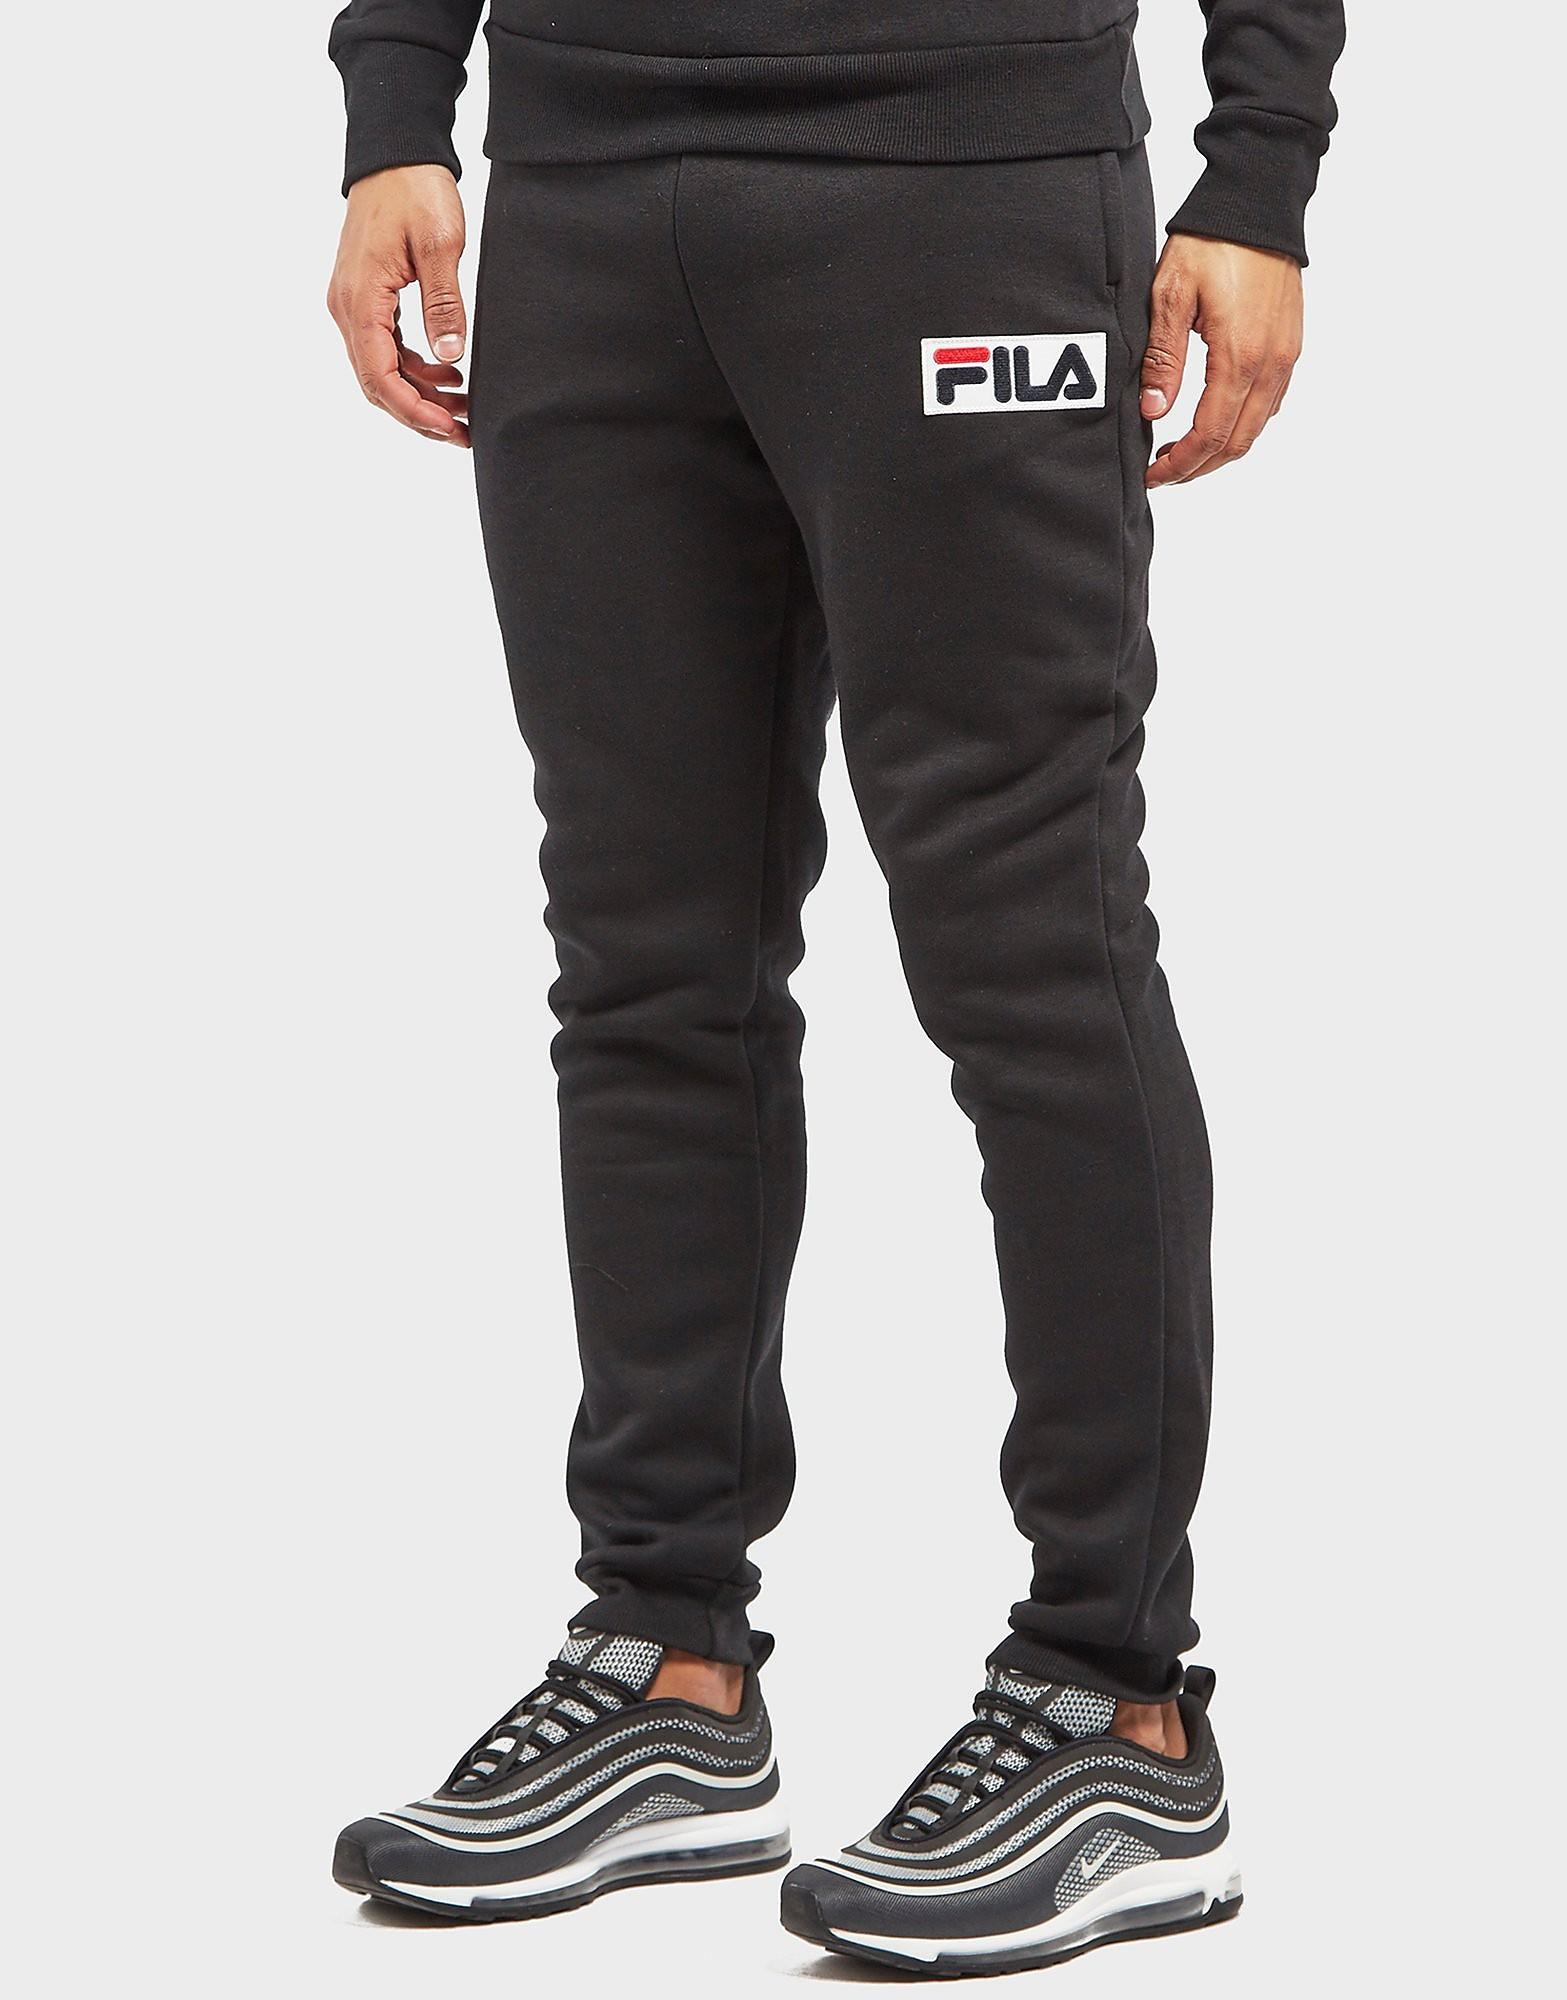 Fila Lazey Cuffed Track Pants